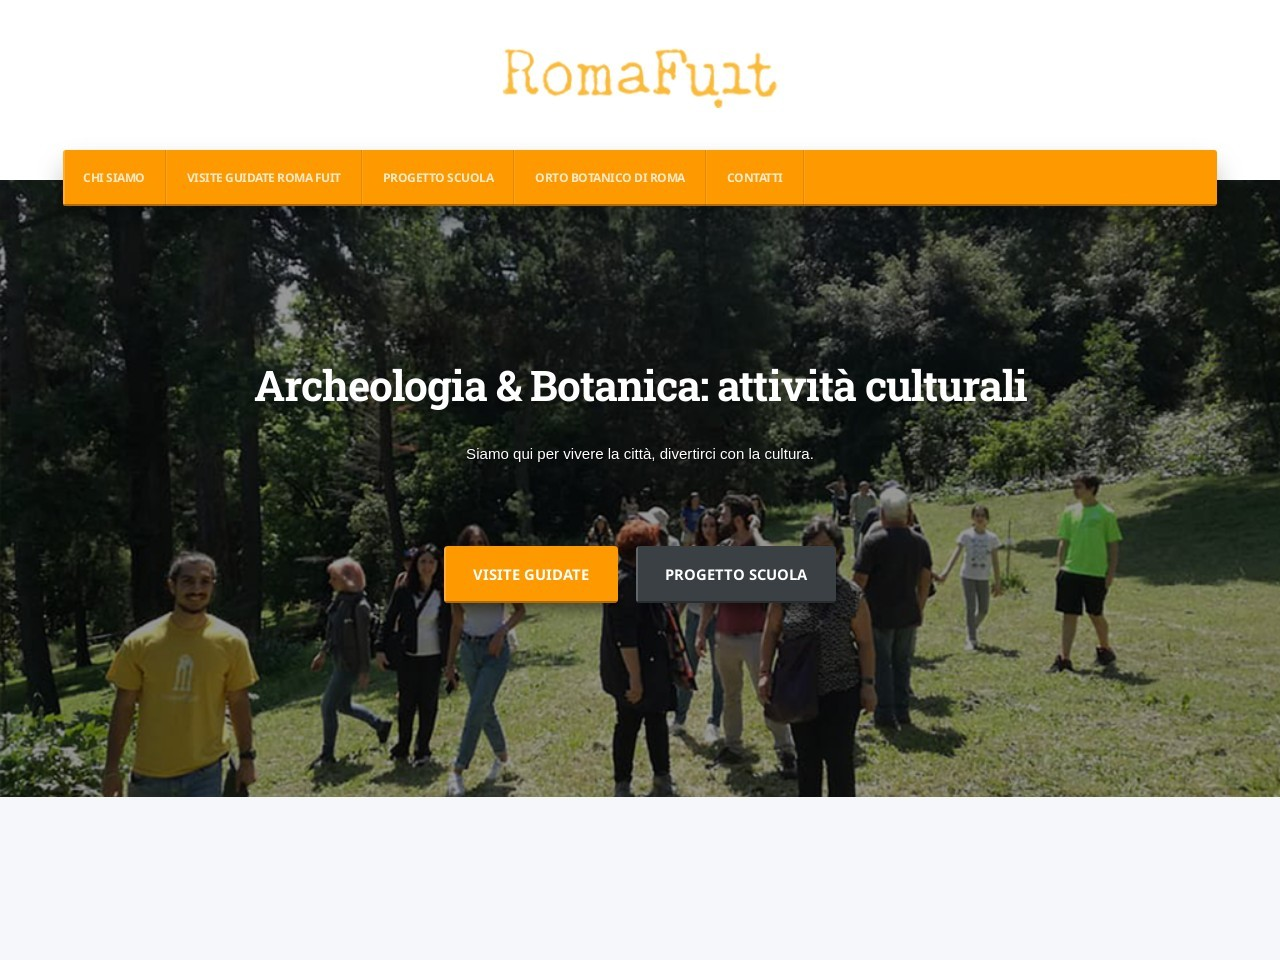 romafuit-archeologia-e-storia-di-roma